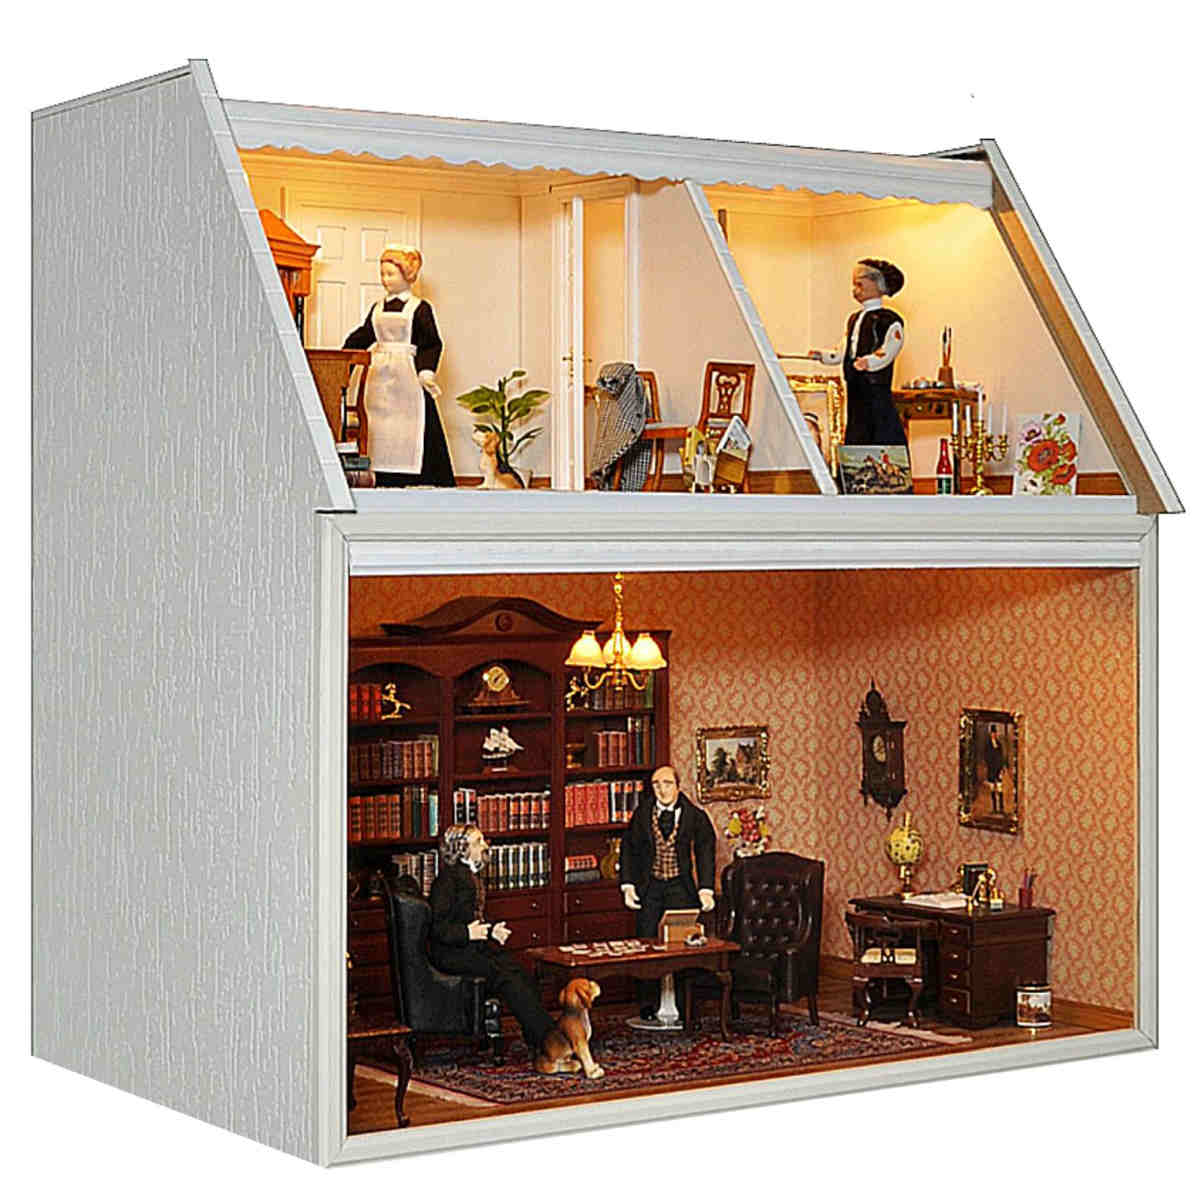 kleines modul box haus mit panorama dachgeschoss 90170. Black Bedroom Furniture Sets. Home Design Ideas